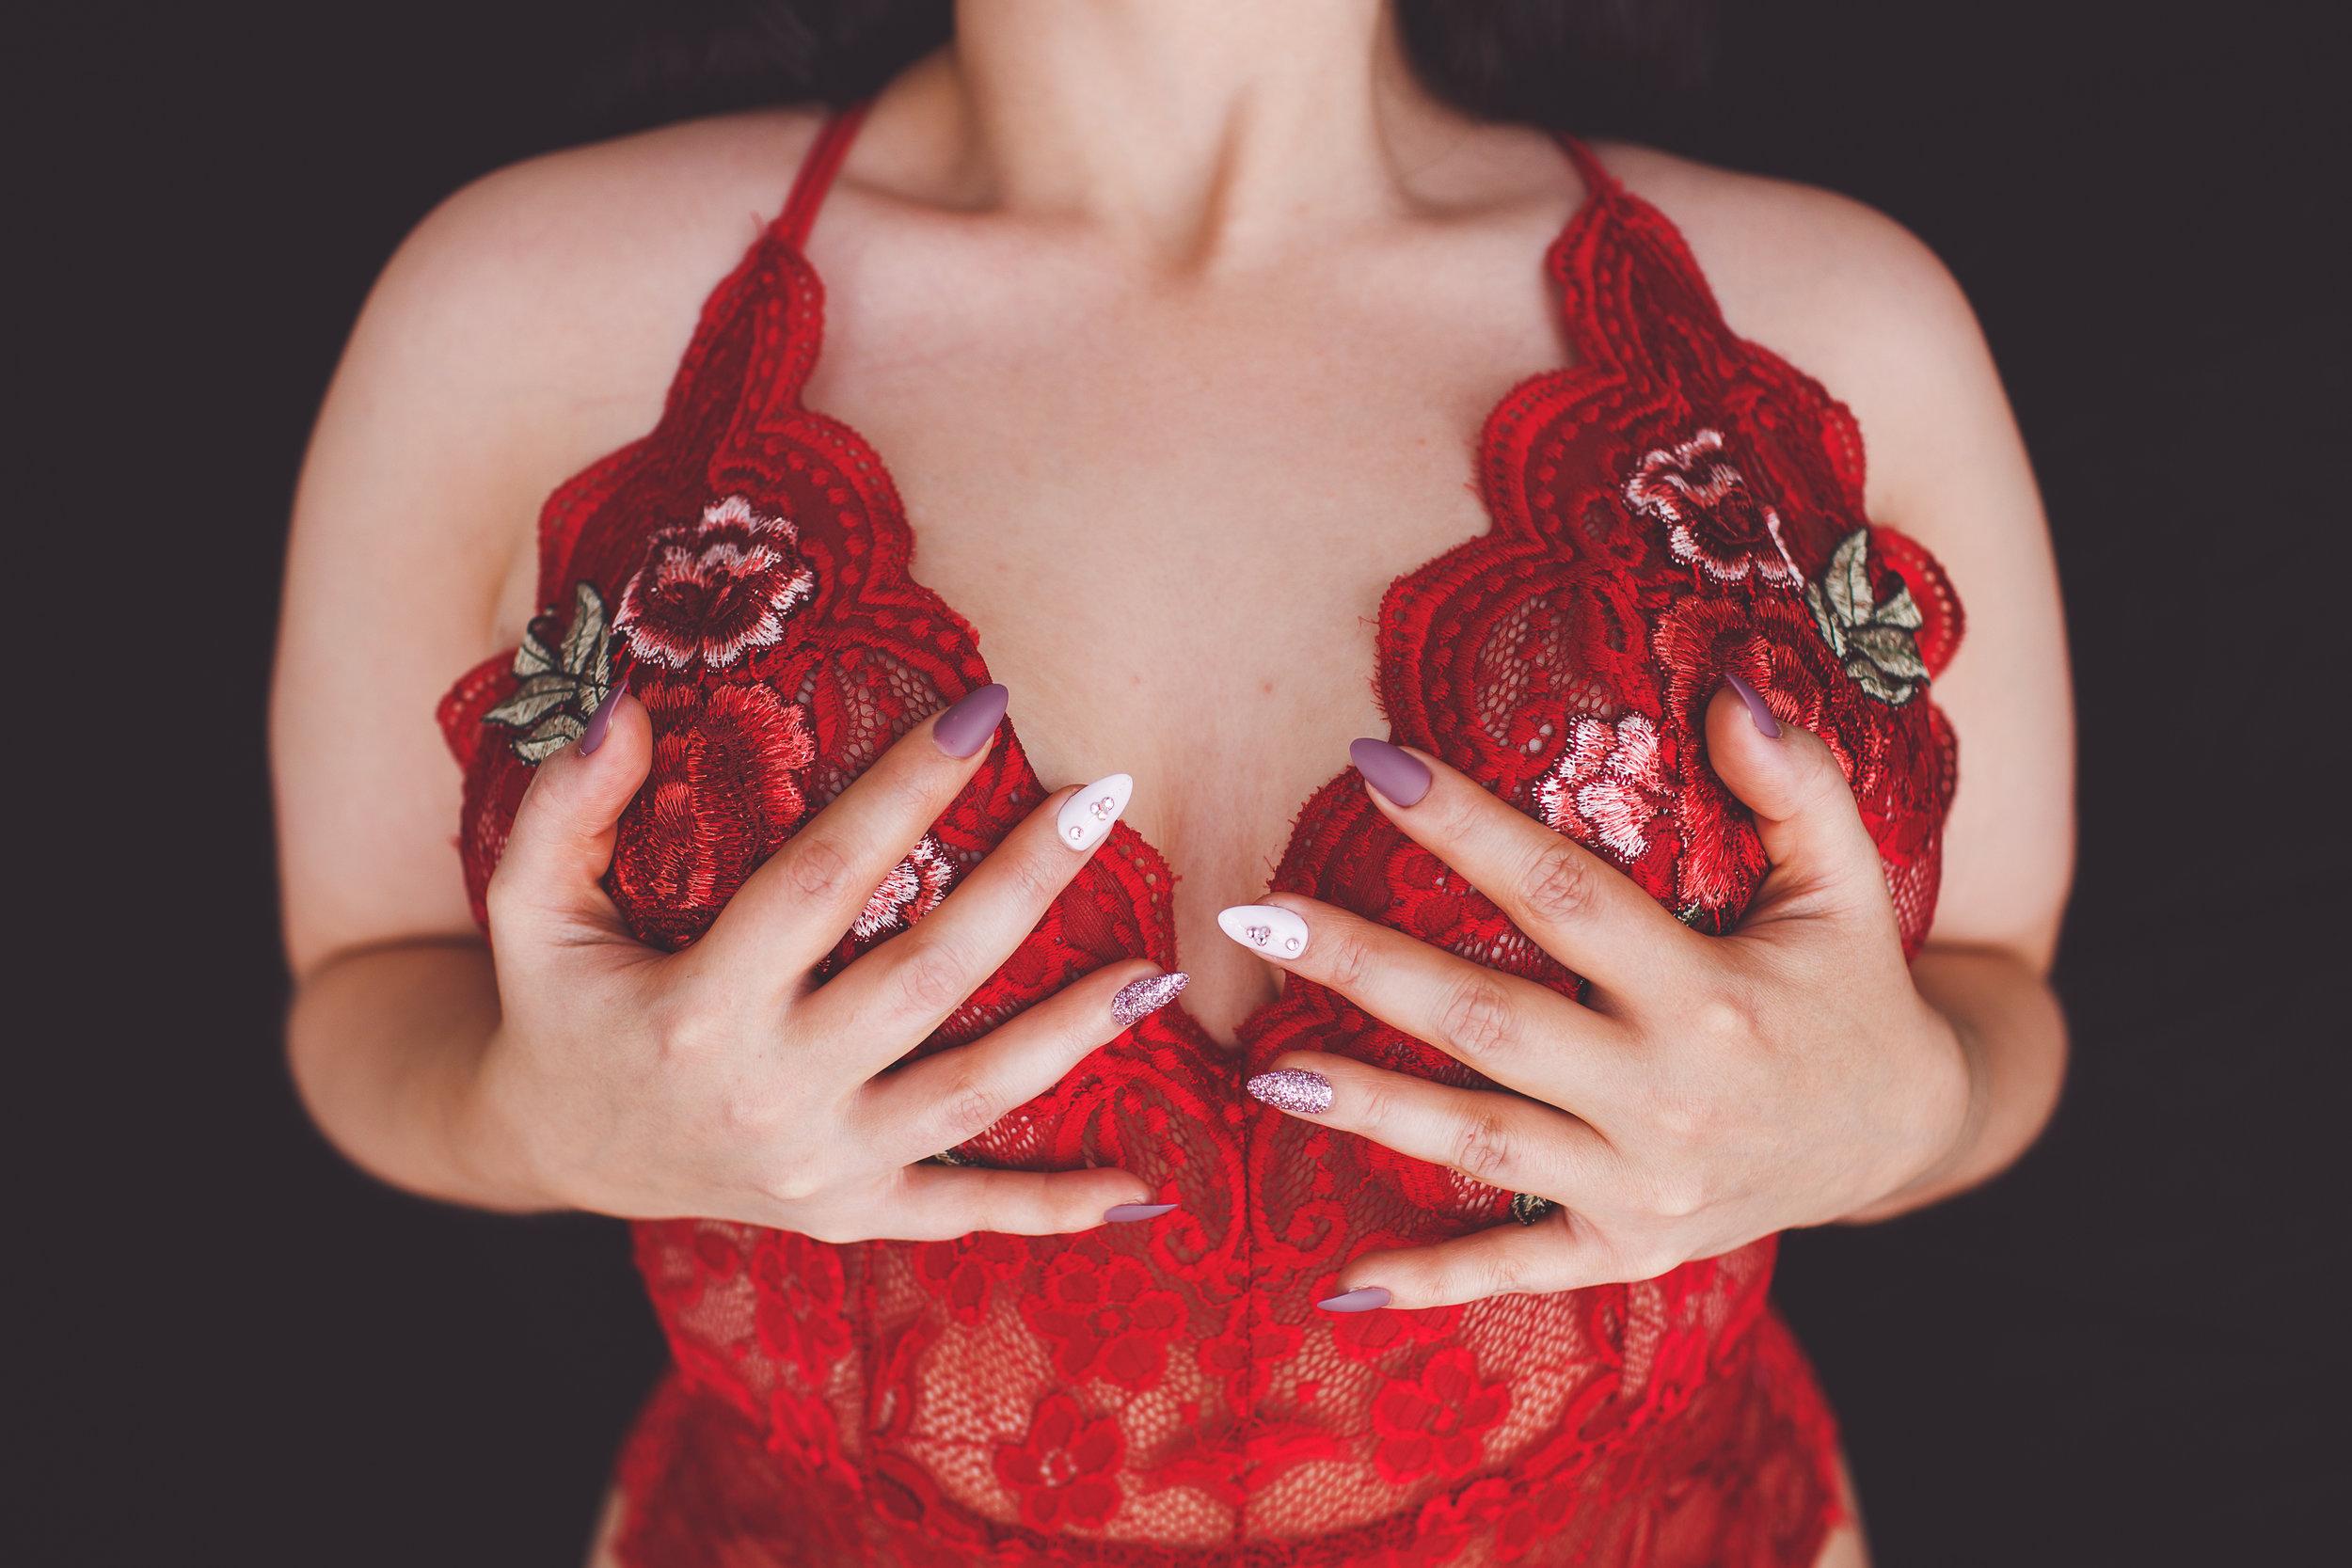 Columbus-Ohio-Boudoir-Photos-Ohio-intimate-womxn-portrait-photographer-grabbing-boobs-chest-collar-bones-fingernails-red-floral-bodysuit-marcyharrisortiz.jpg